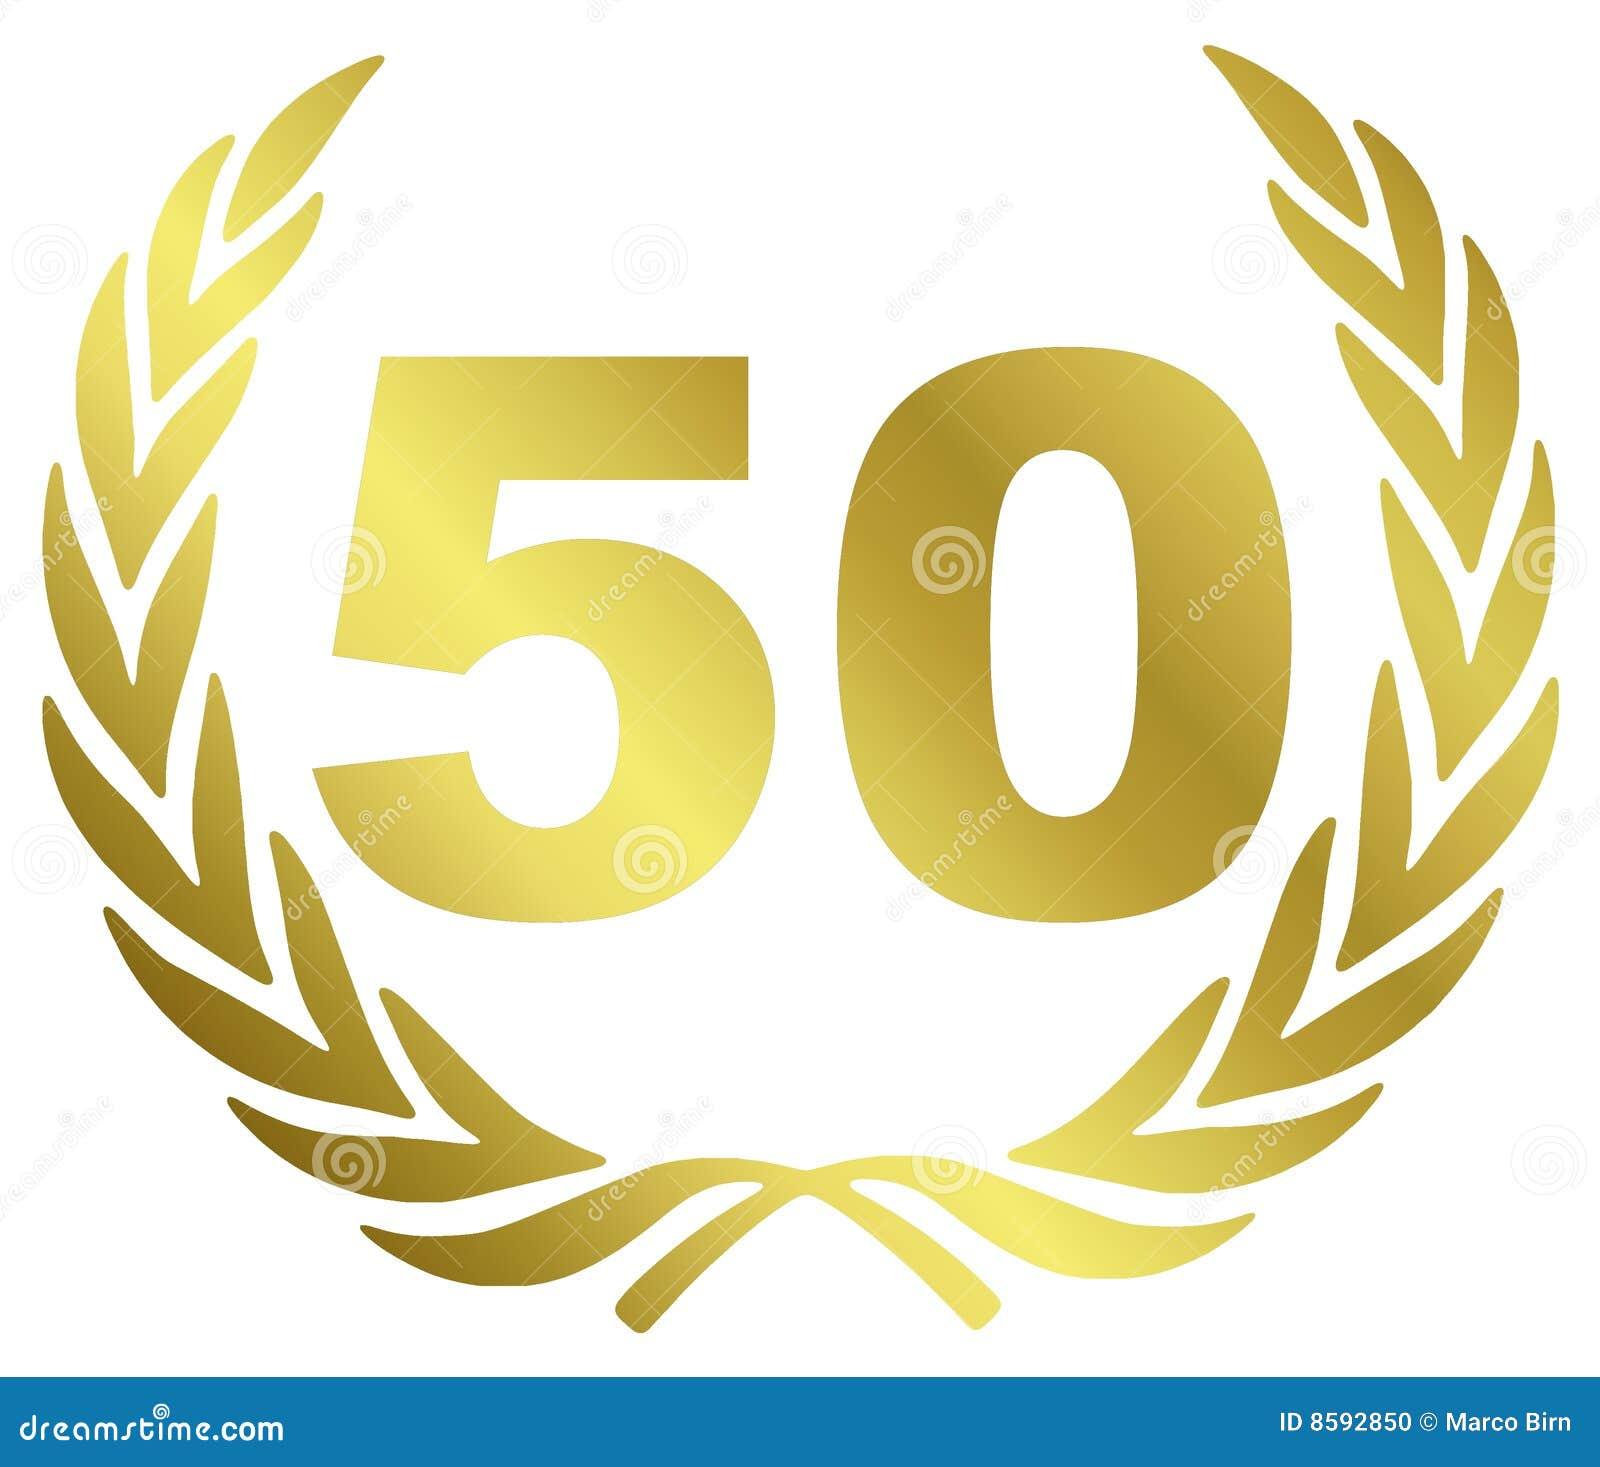 50 Wedding Anniversary Invitation as perfect invitation sample